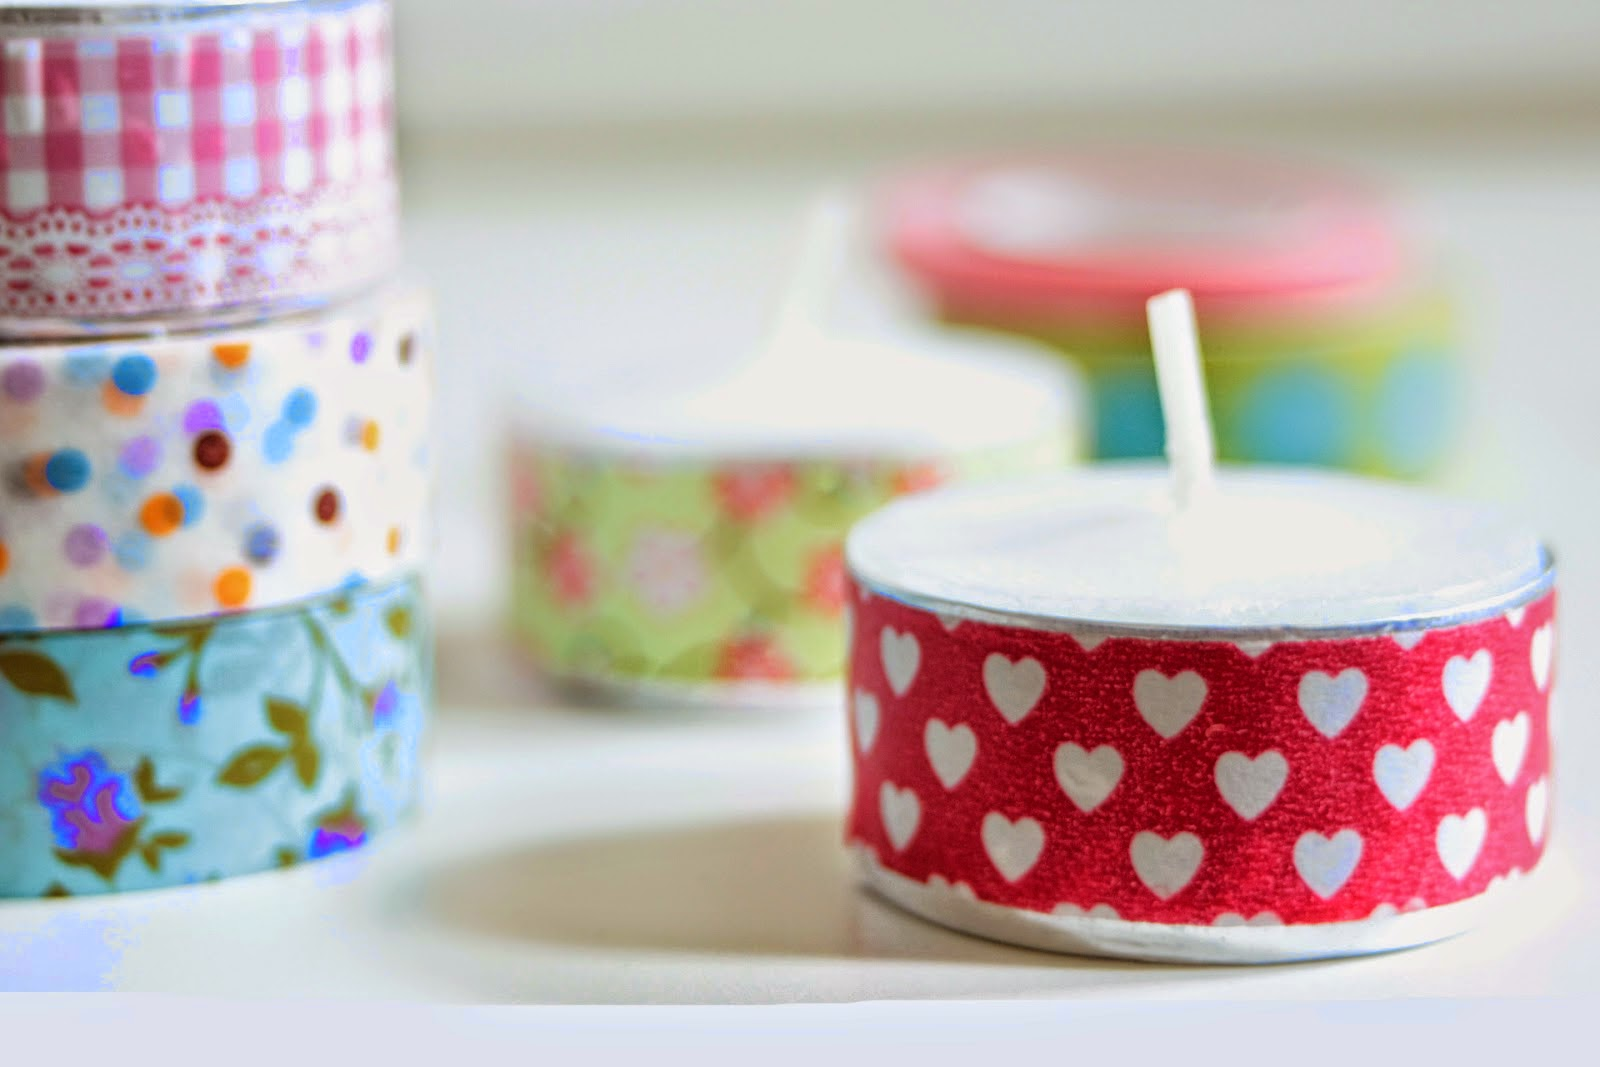 http://www.makoccino.com/2014/07/9-ideas-how-to-use-washi-tape.html